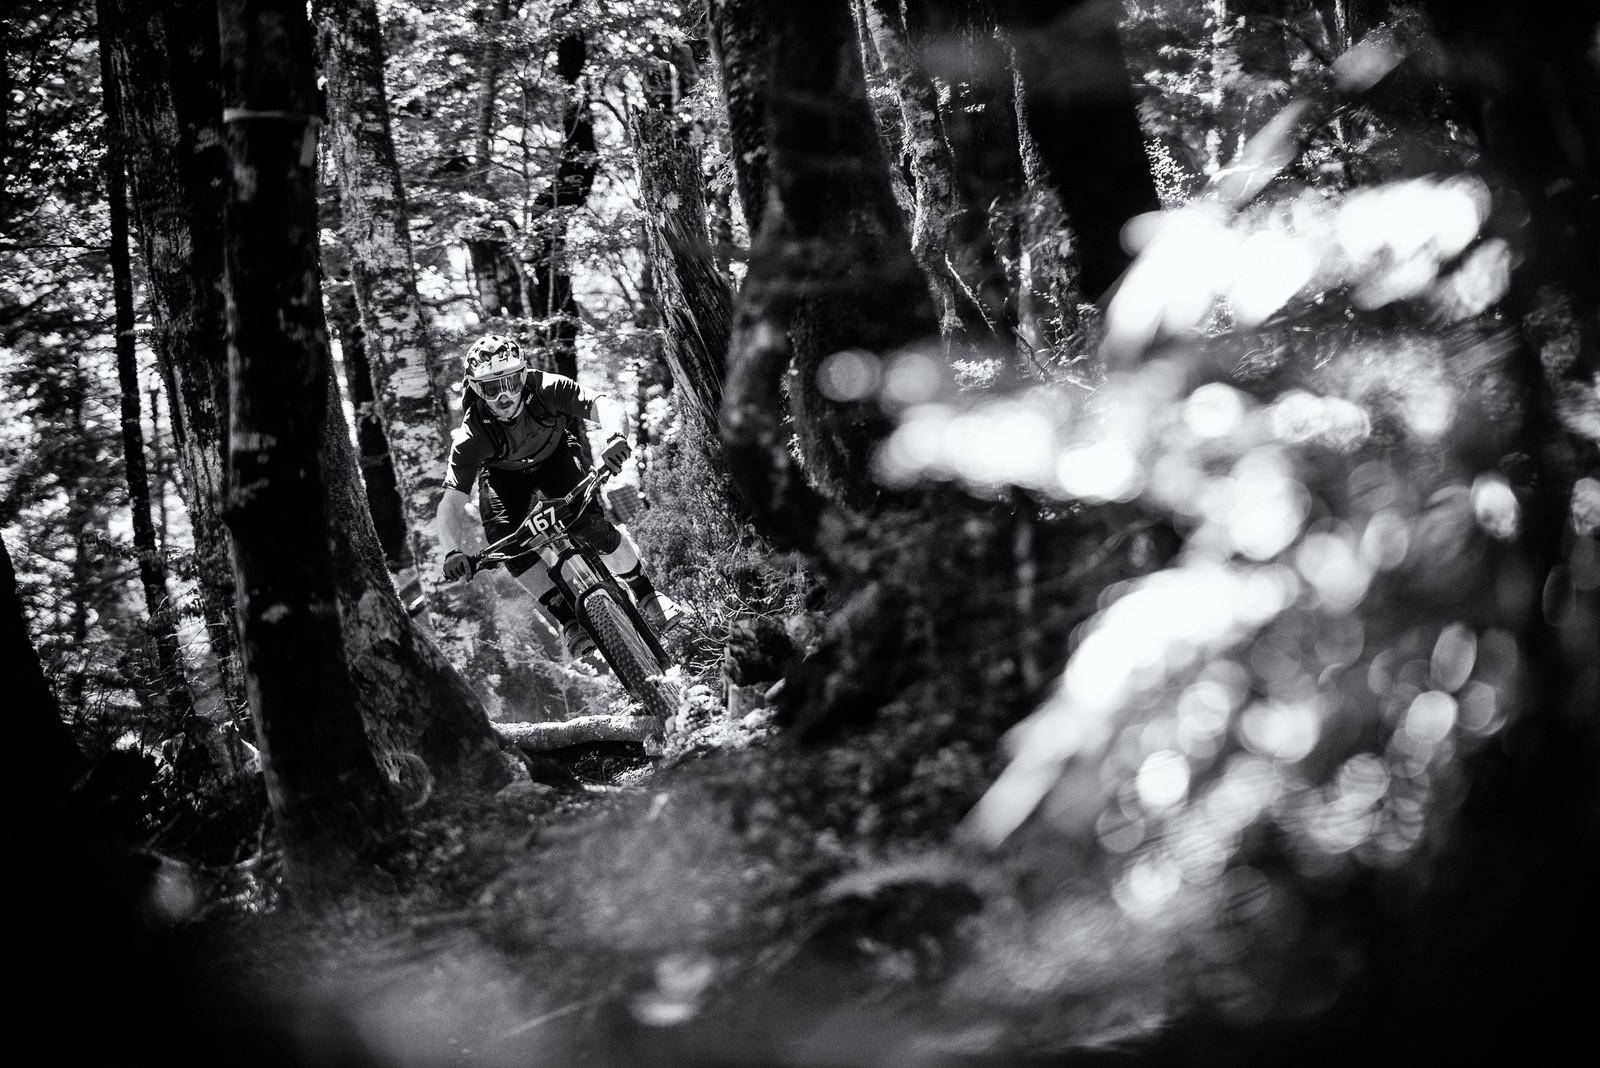 Jimmy Pollard - 2019 Dodzy Memorial Enduro - Mountain Biking Pictures - Vital MTB